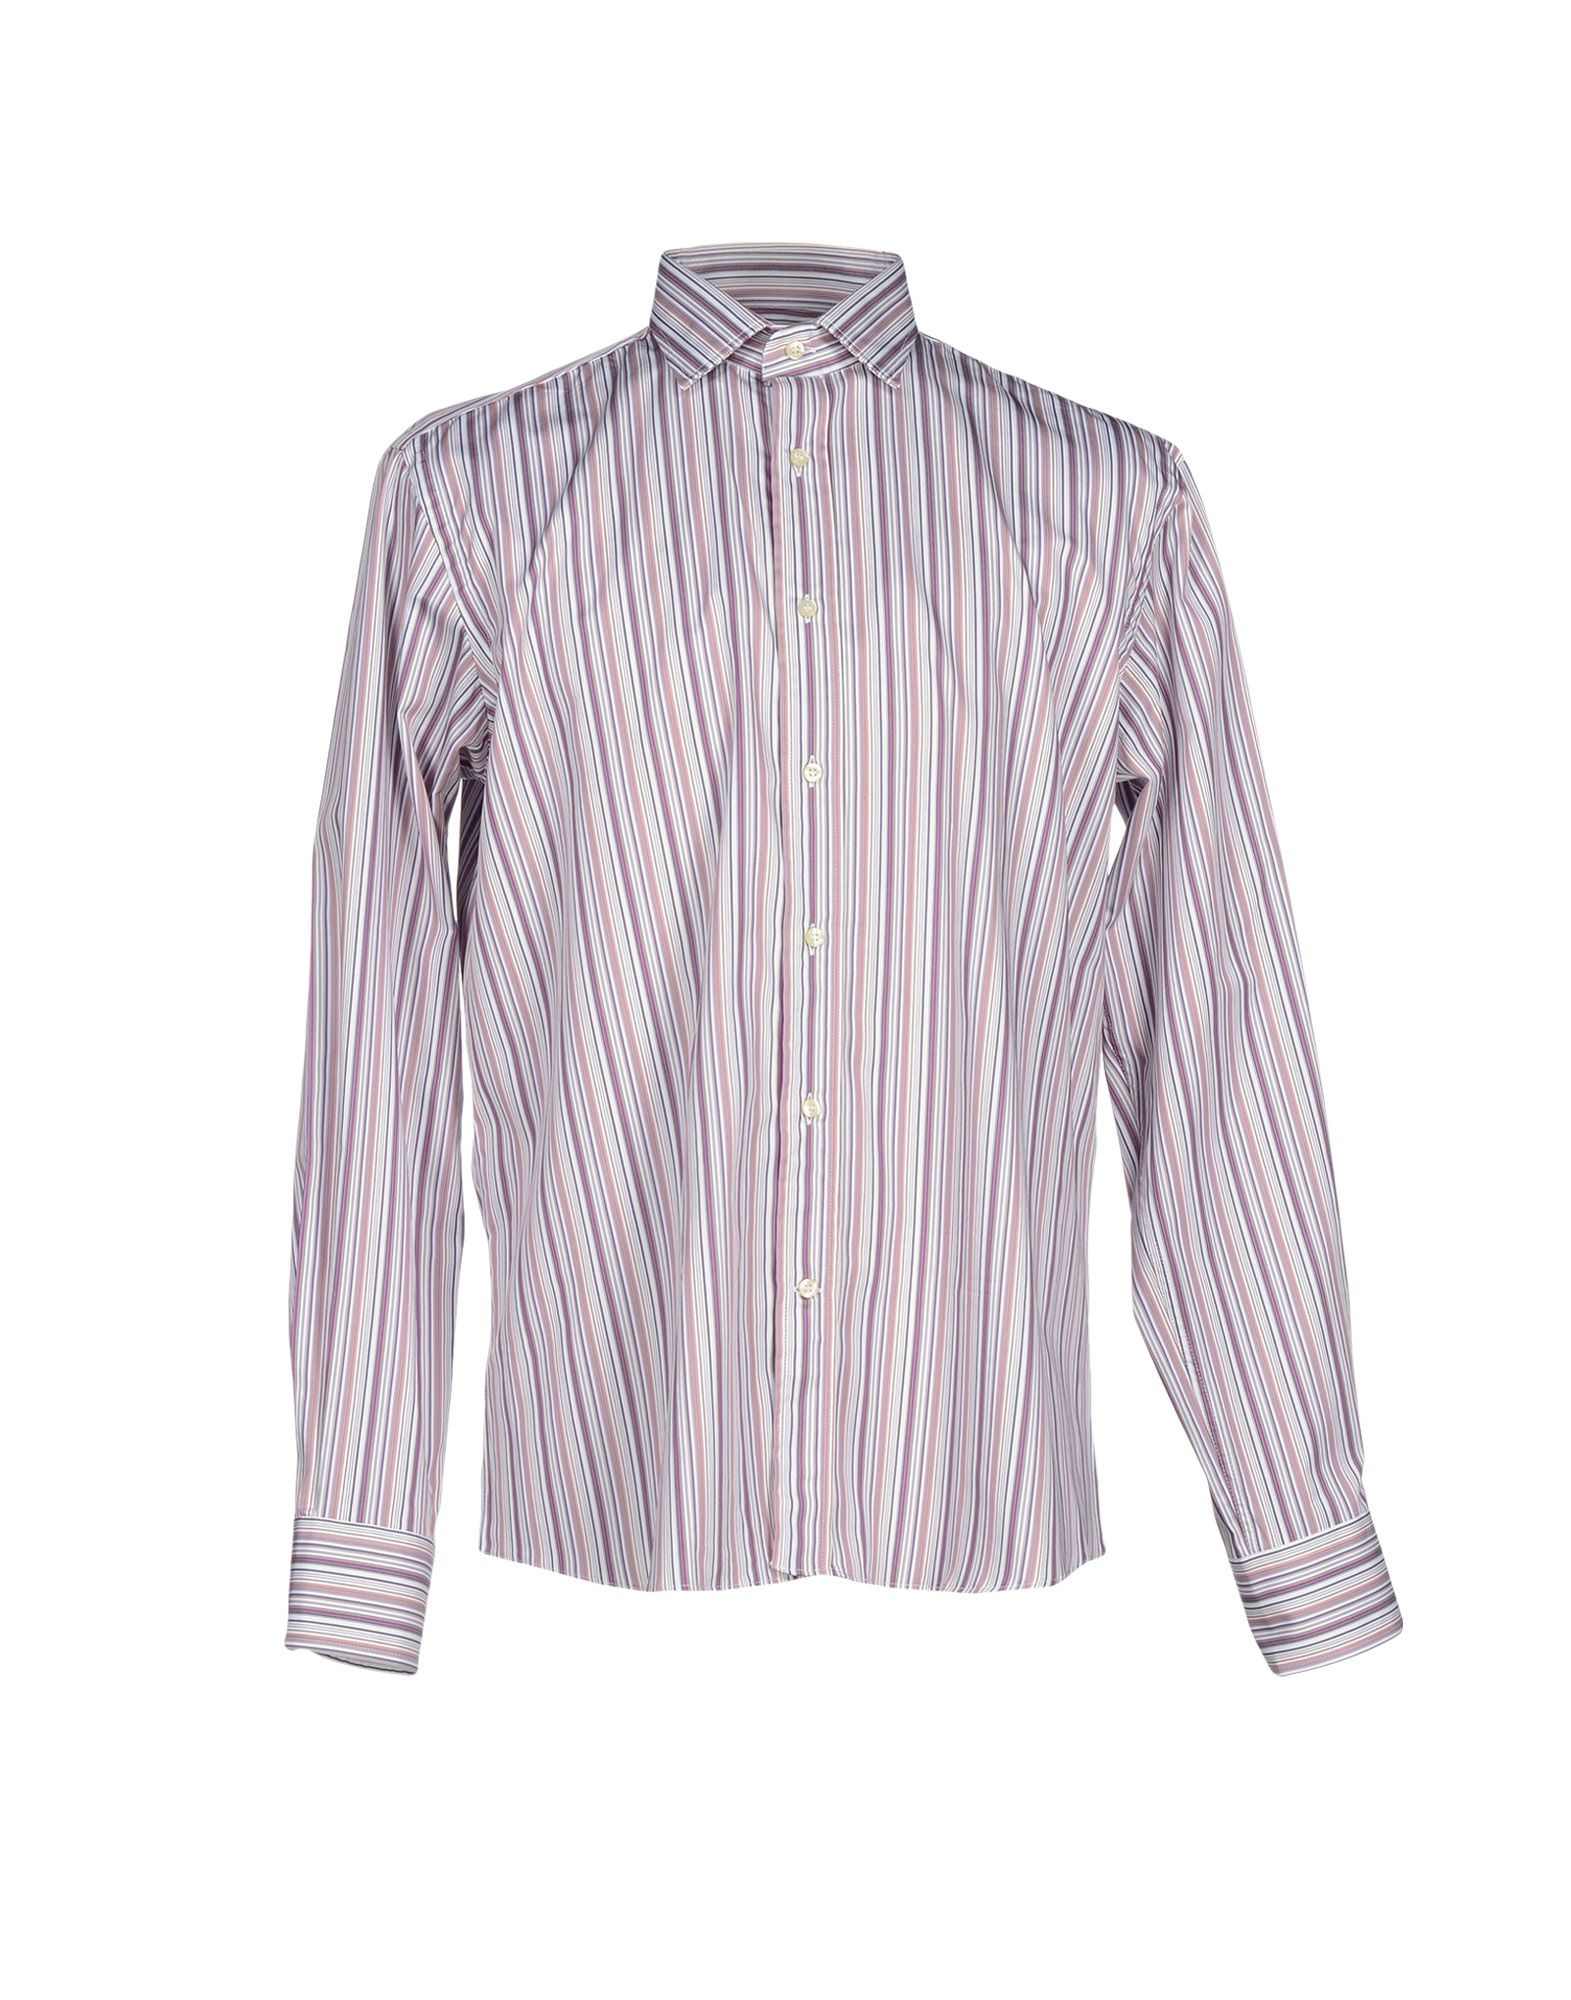 Etro shirt for men lyst for Etro men s shirts